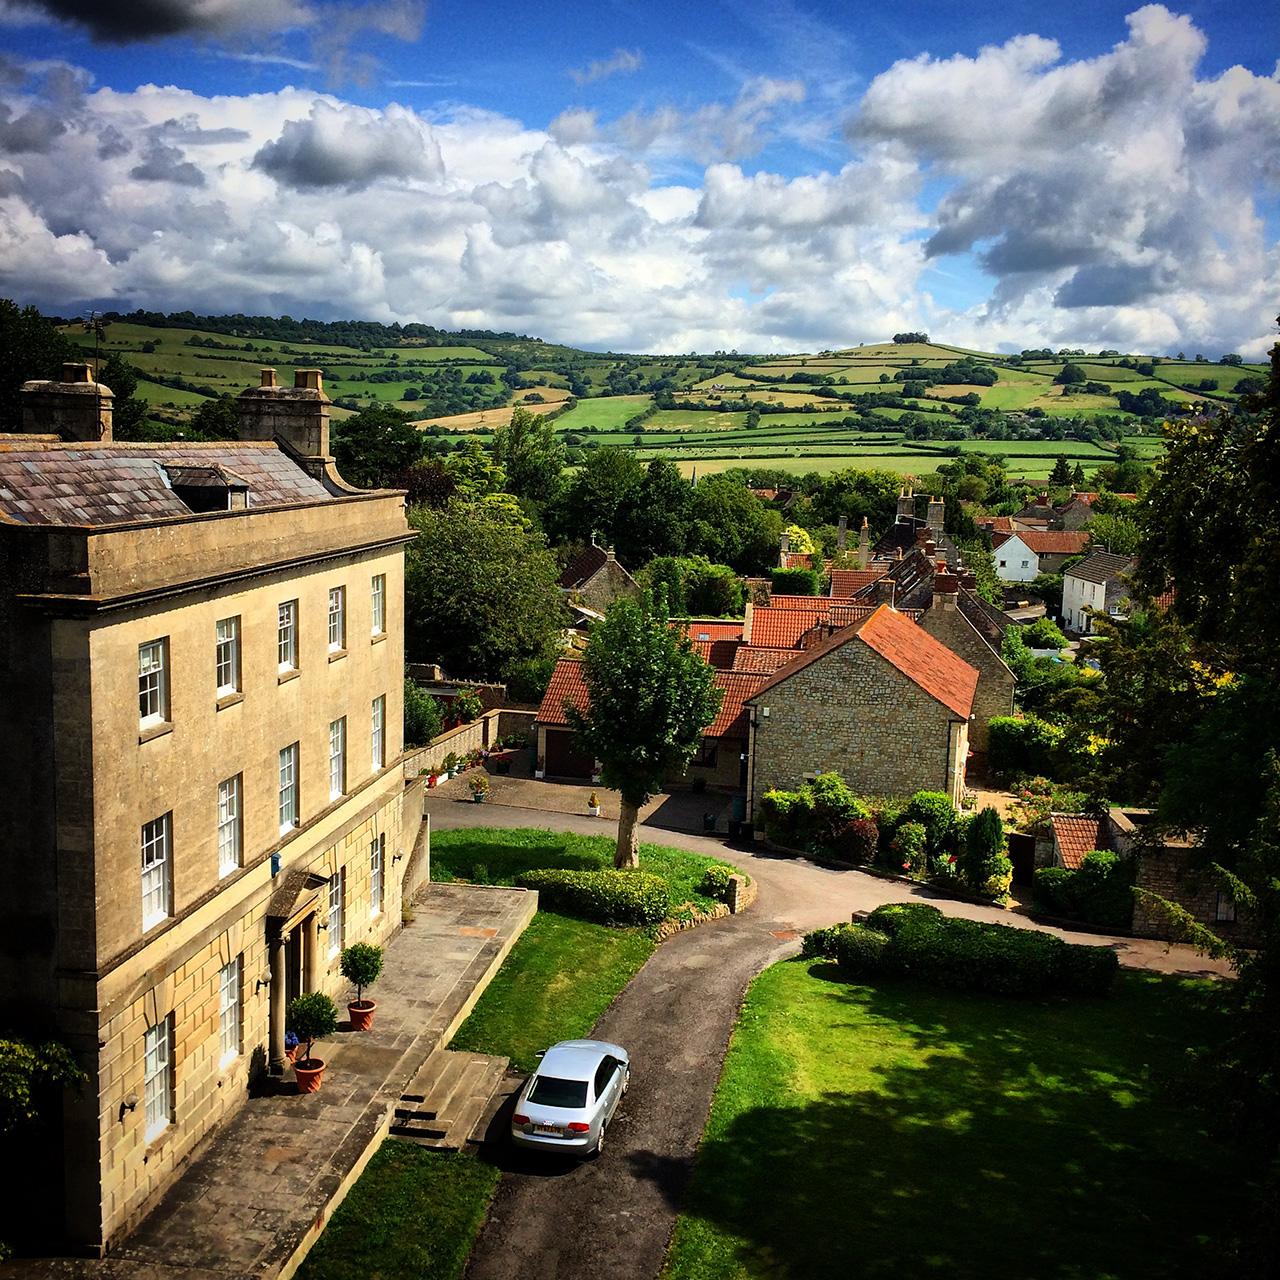 View over Saltford House towards Kelston Roundhill, taken by Cllr Jon Godfrey